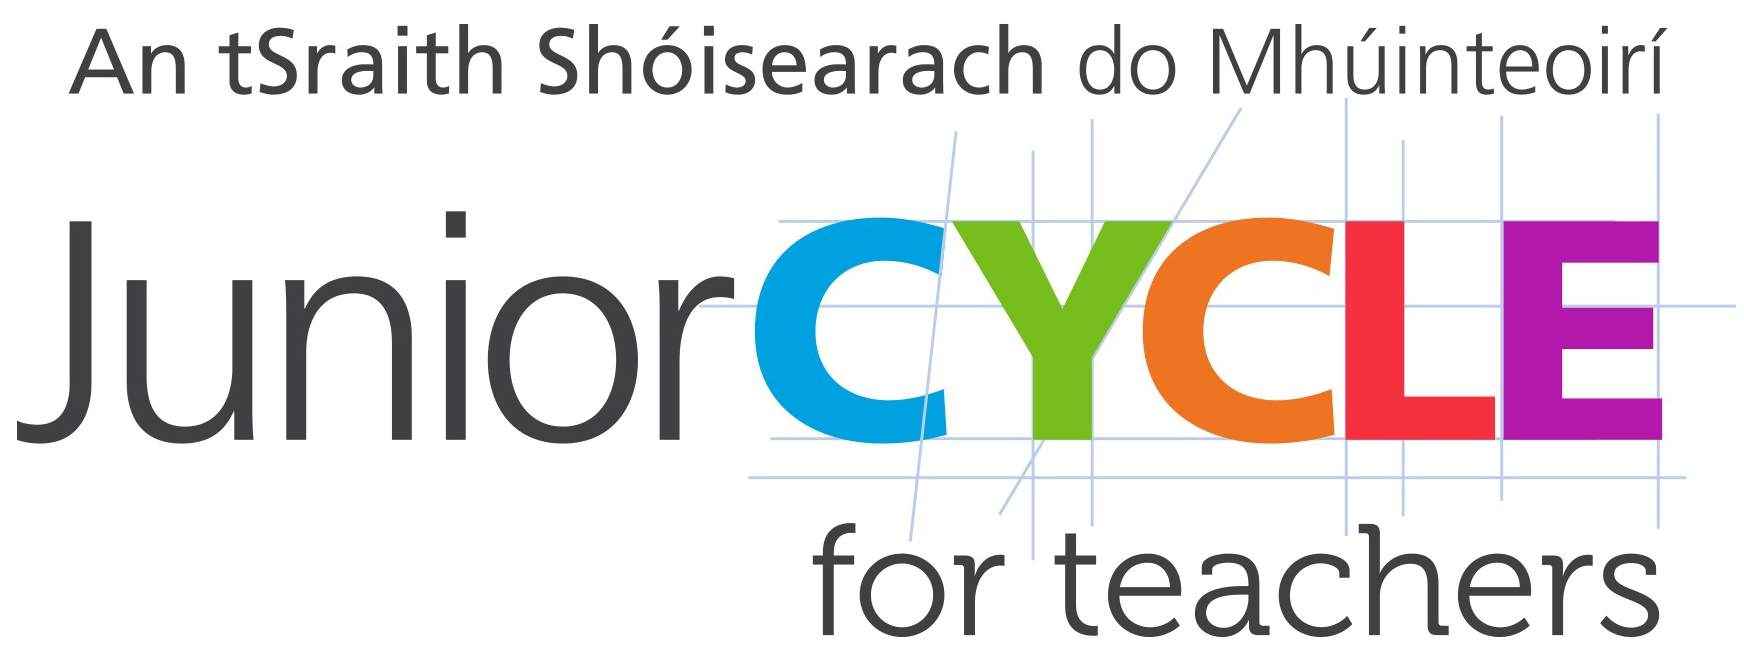 Junior Cycle for Teachers